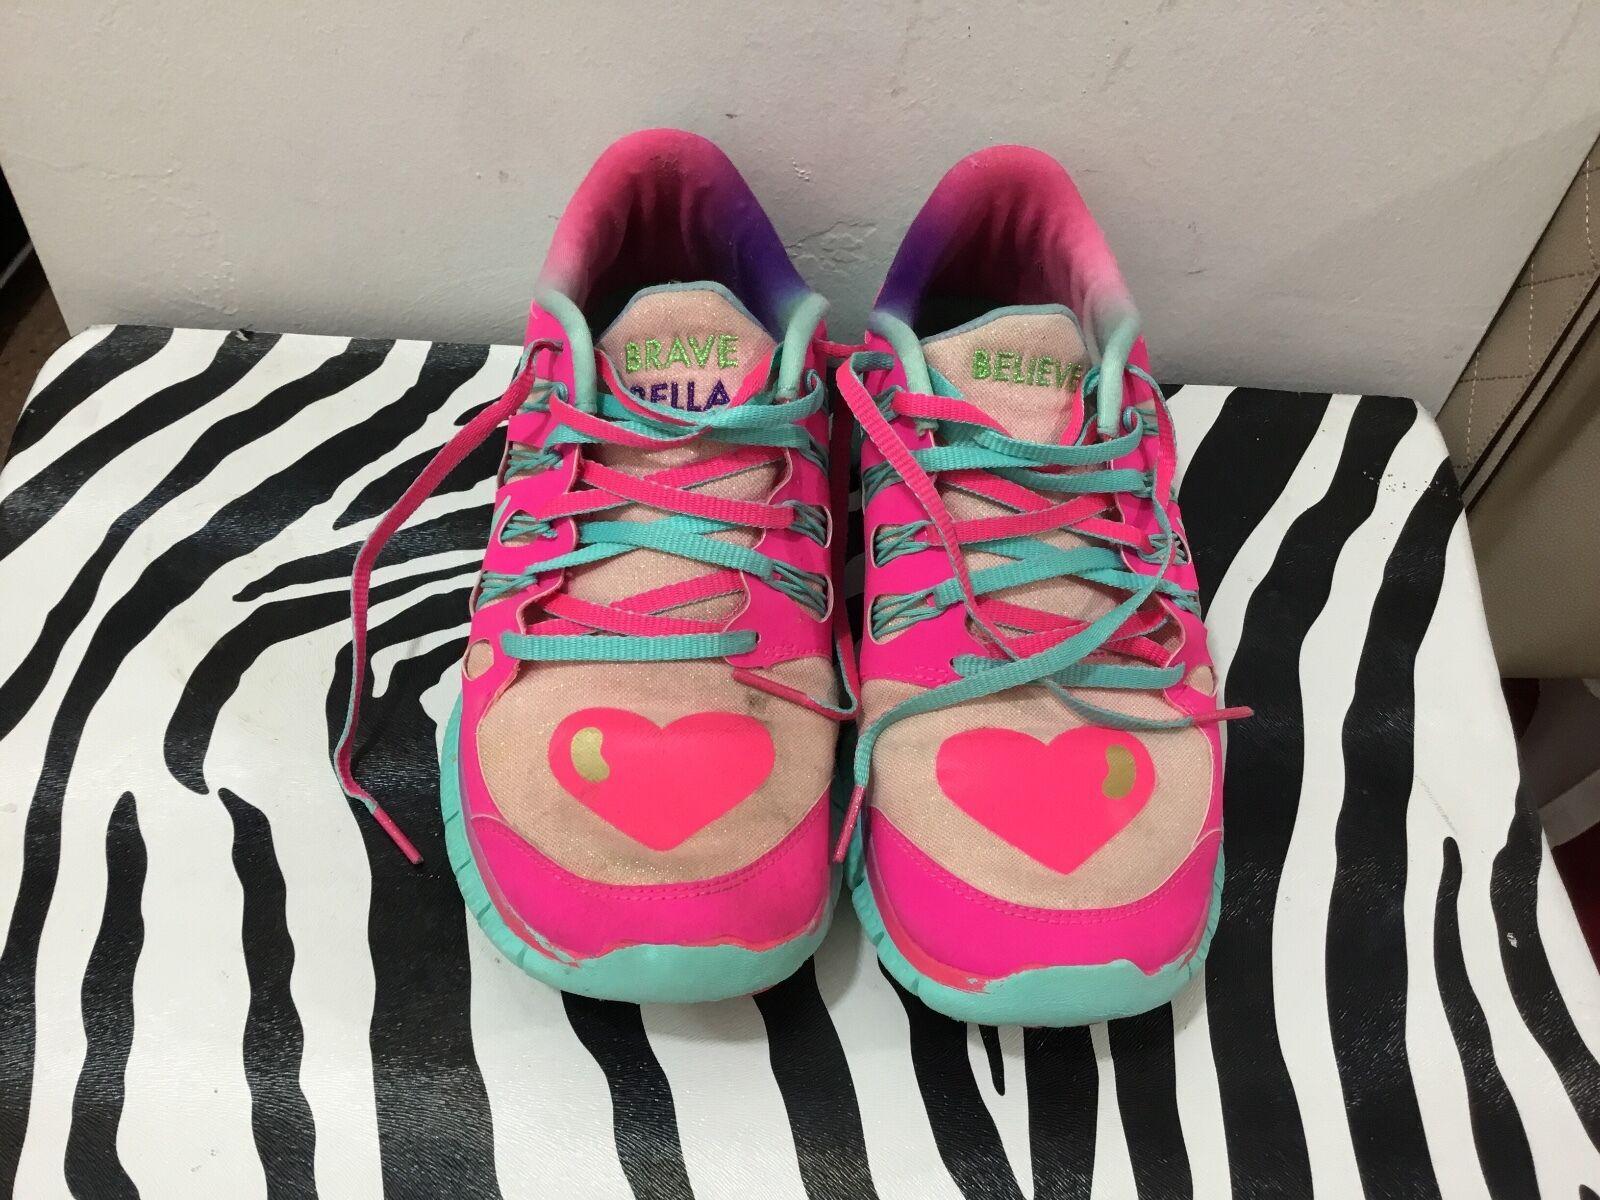 Nike ladies size 8.5 limited edition Doernbecher freestyle designer 2013 Bella a